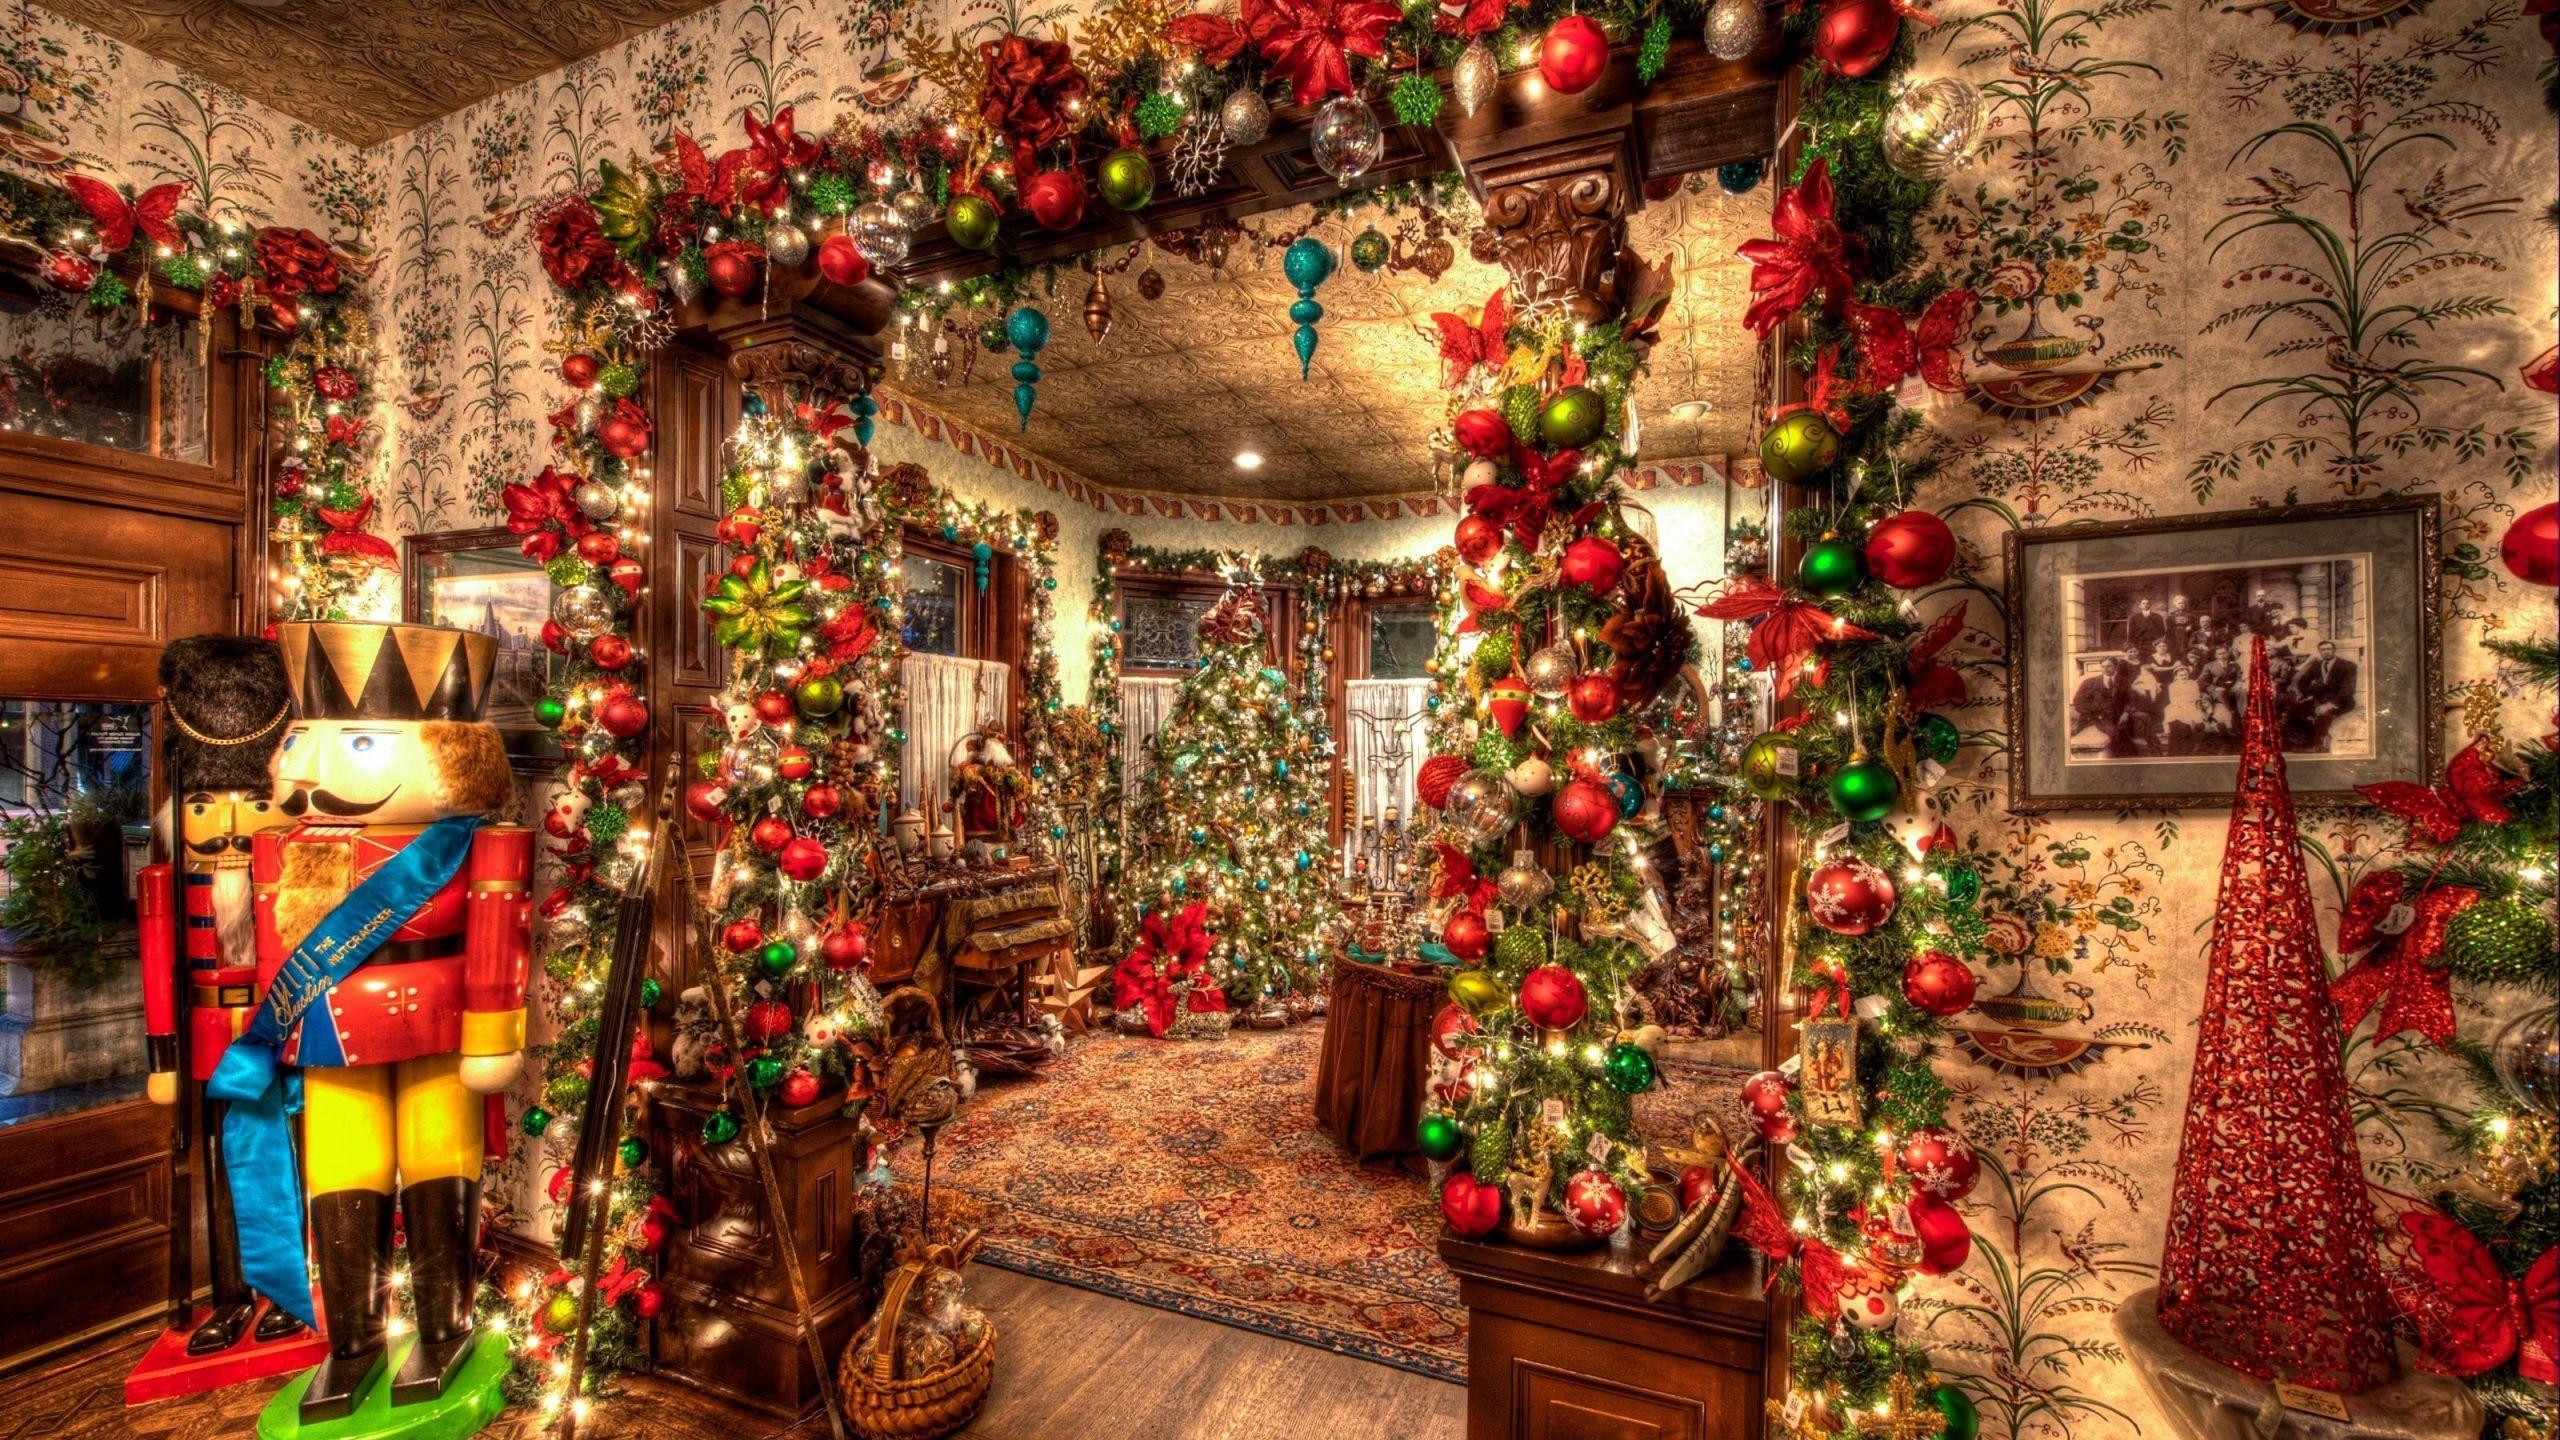 Beautiful Vintage Christmas Desktop Wallpapers Top Free Beautiful Vintage Christmas Desktop Backgrounds Wallpaperaccess